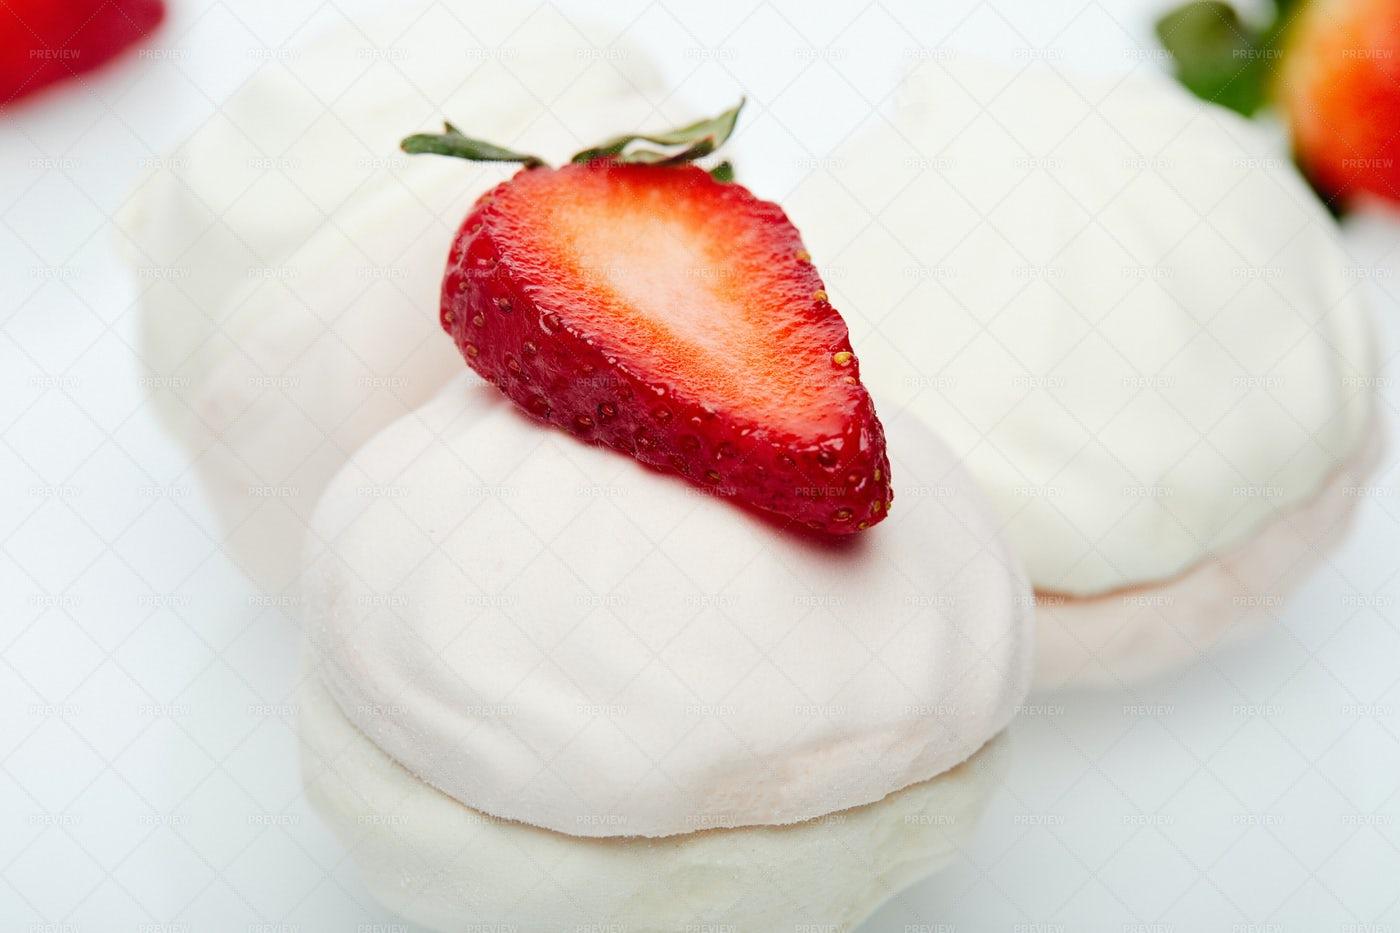 Marshmallows Topped With Fruit: Stock Photos